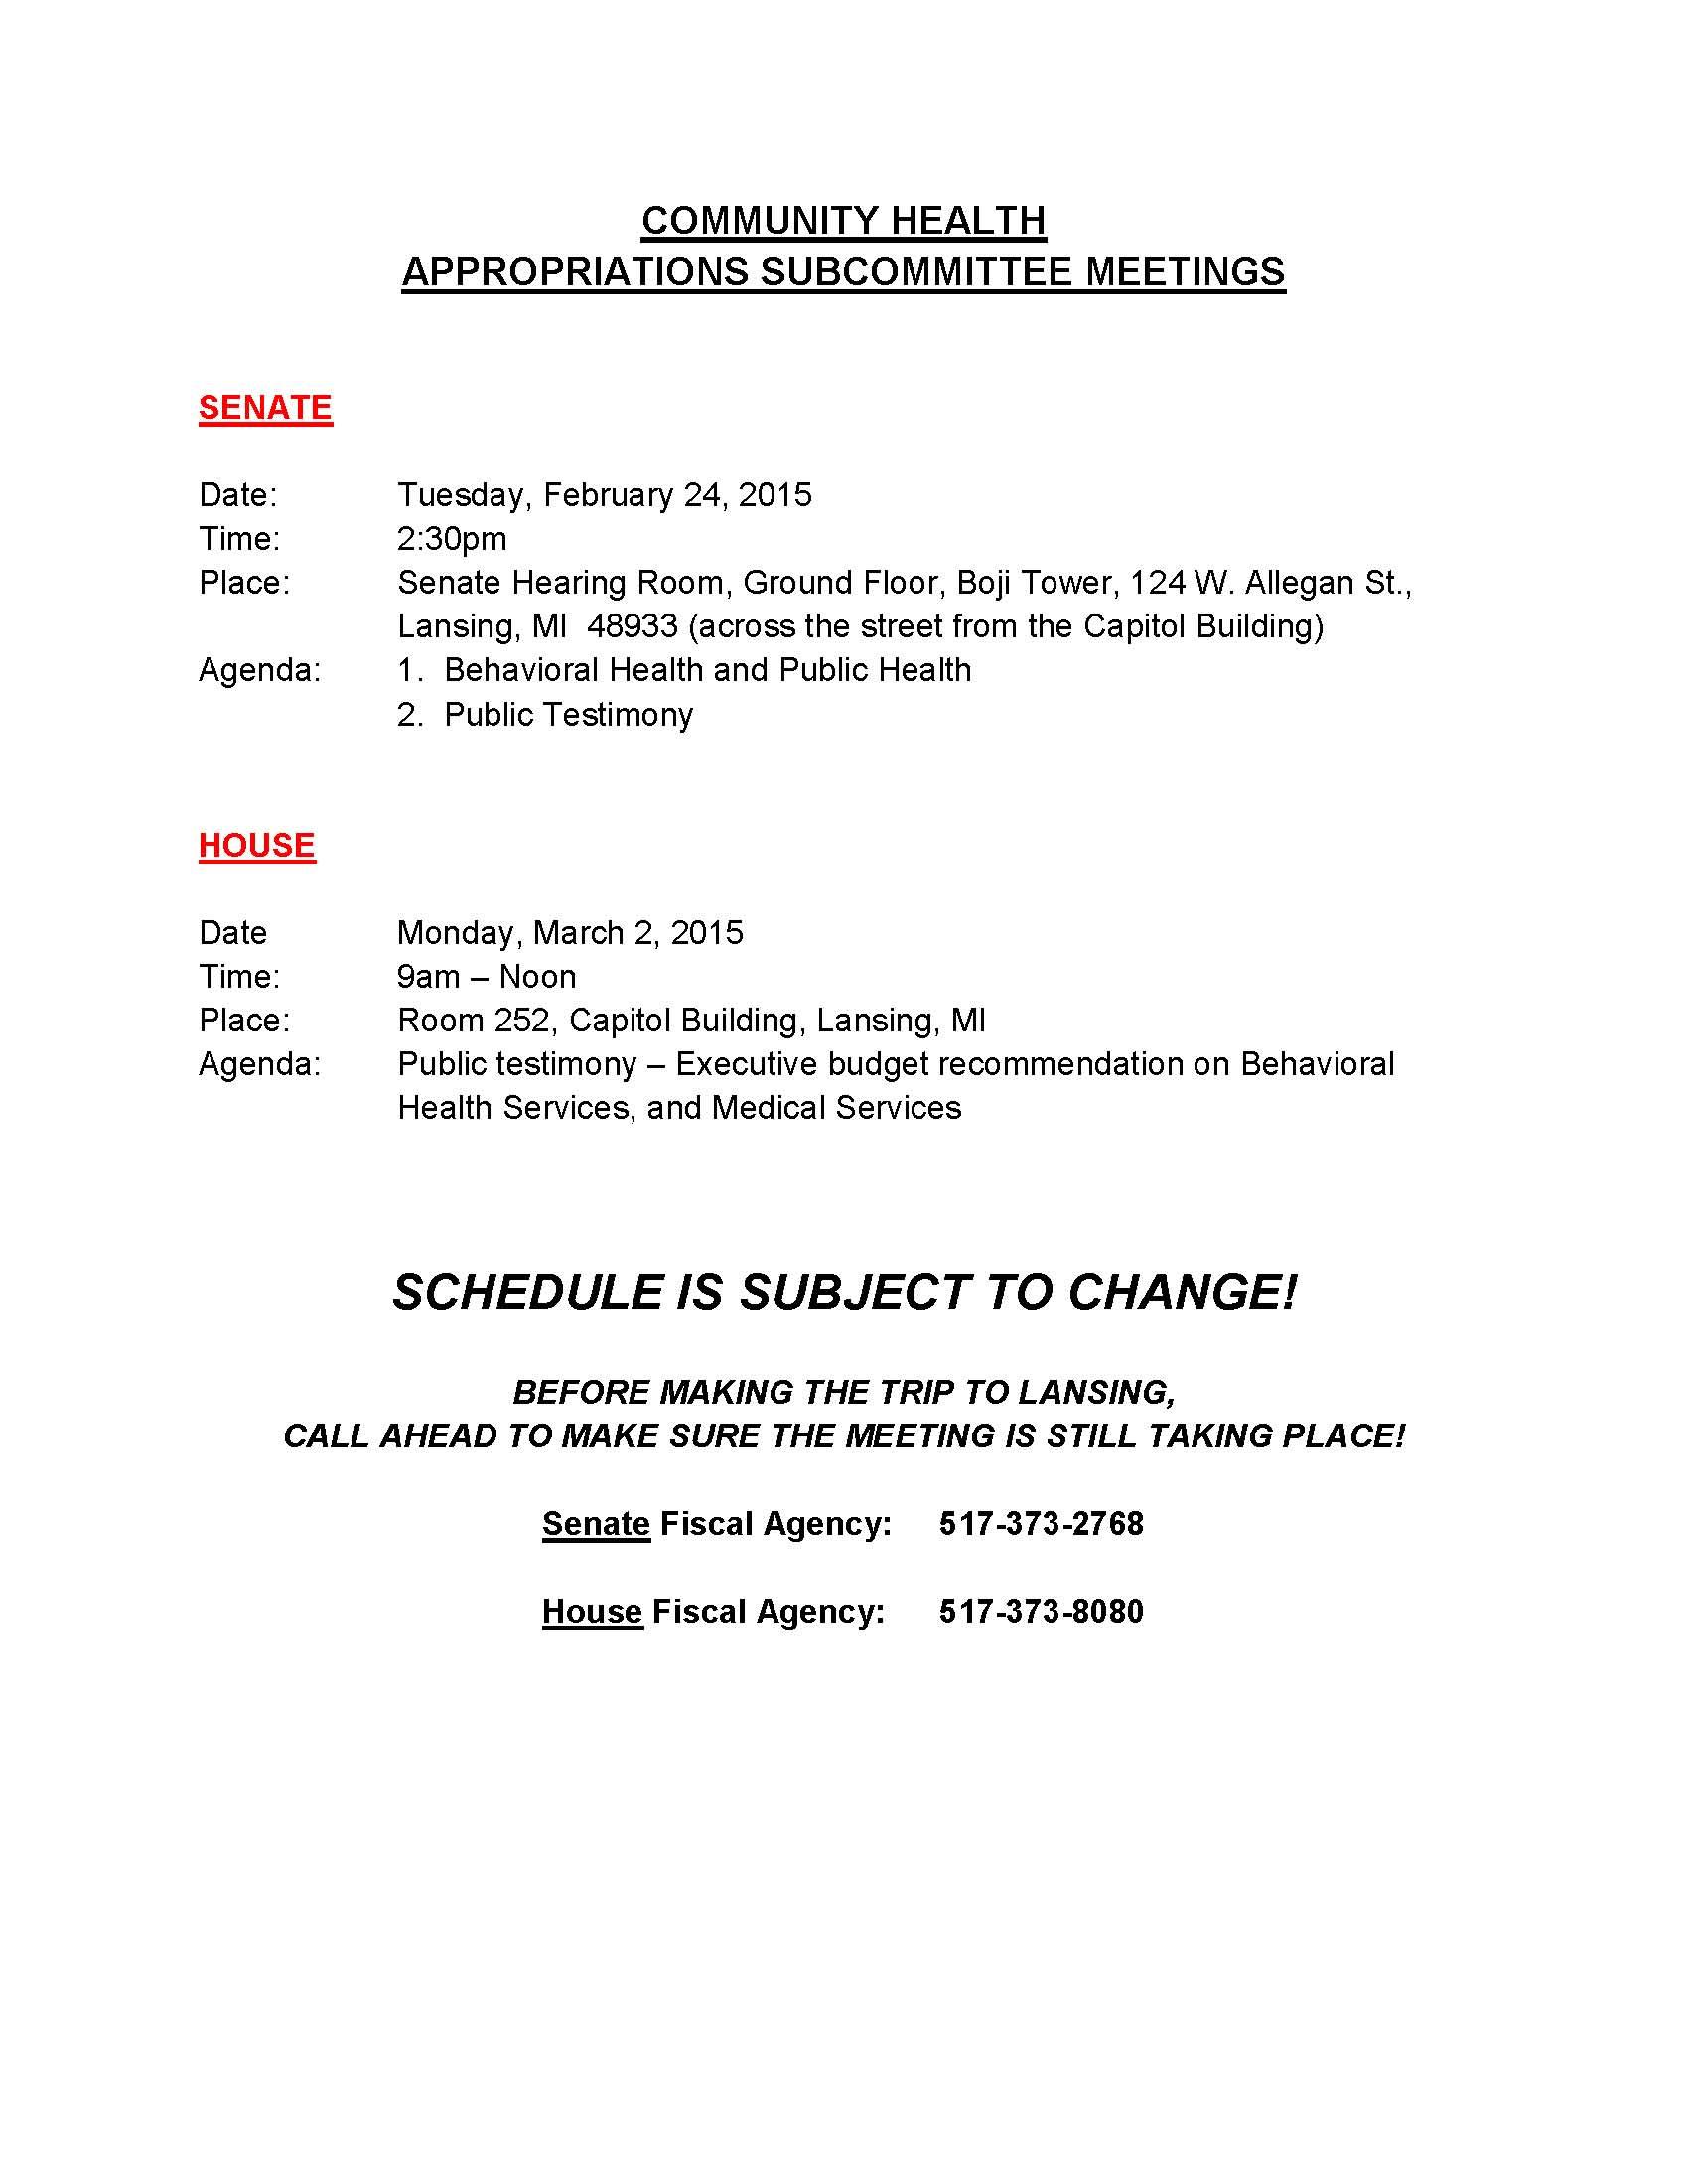 DCH Budget Meeting Schedule 2015